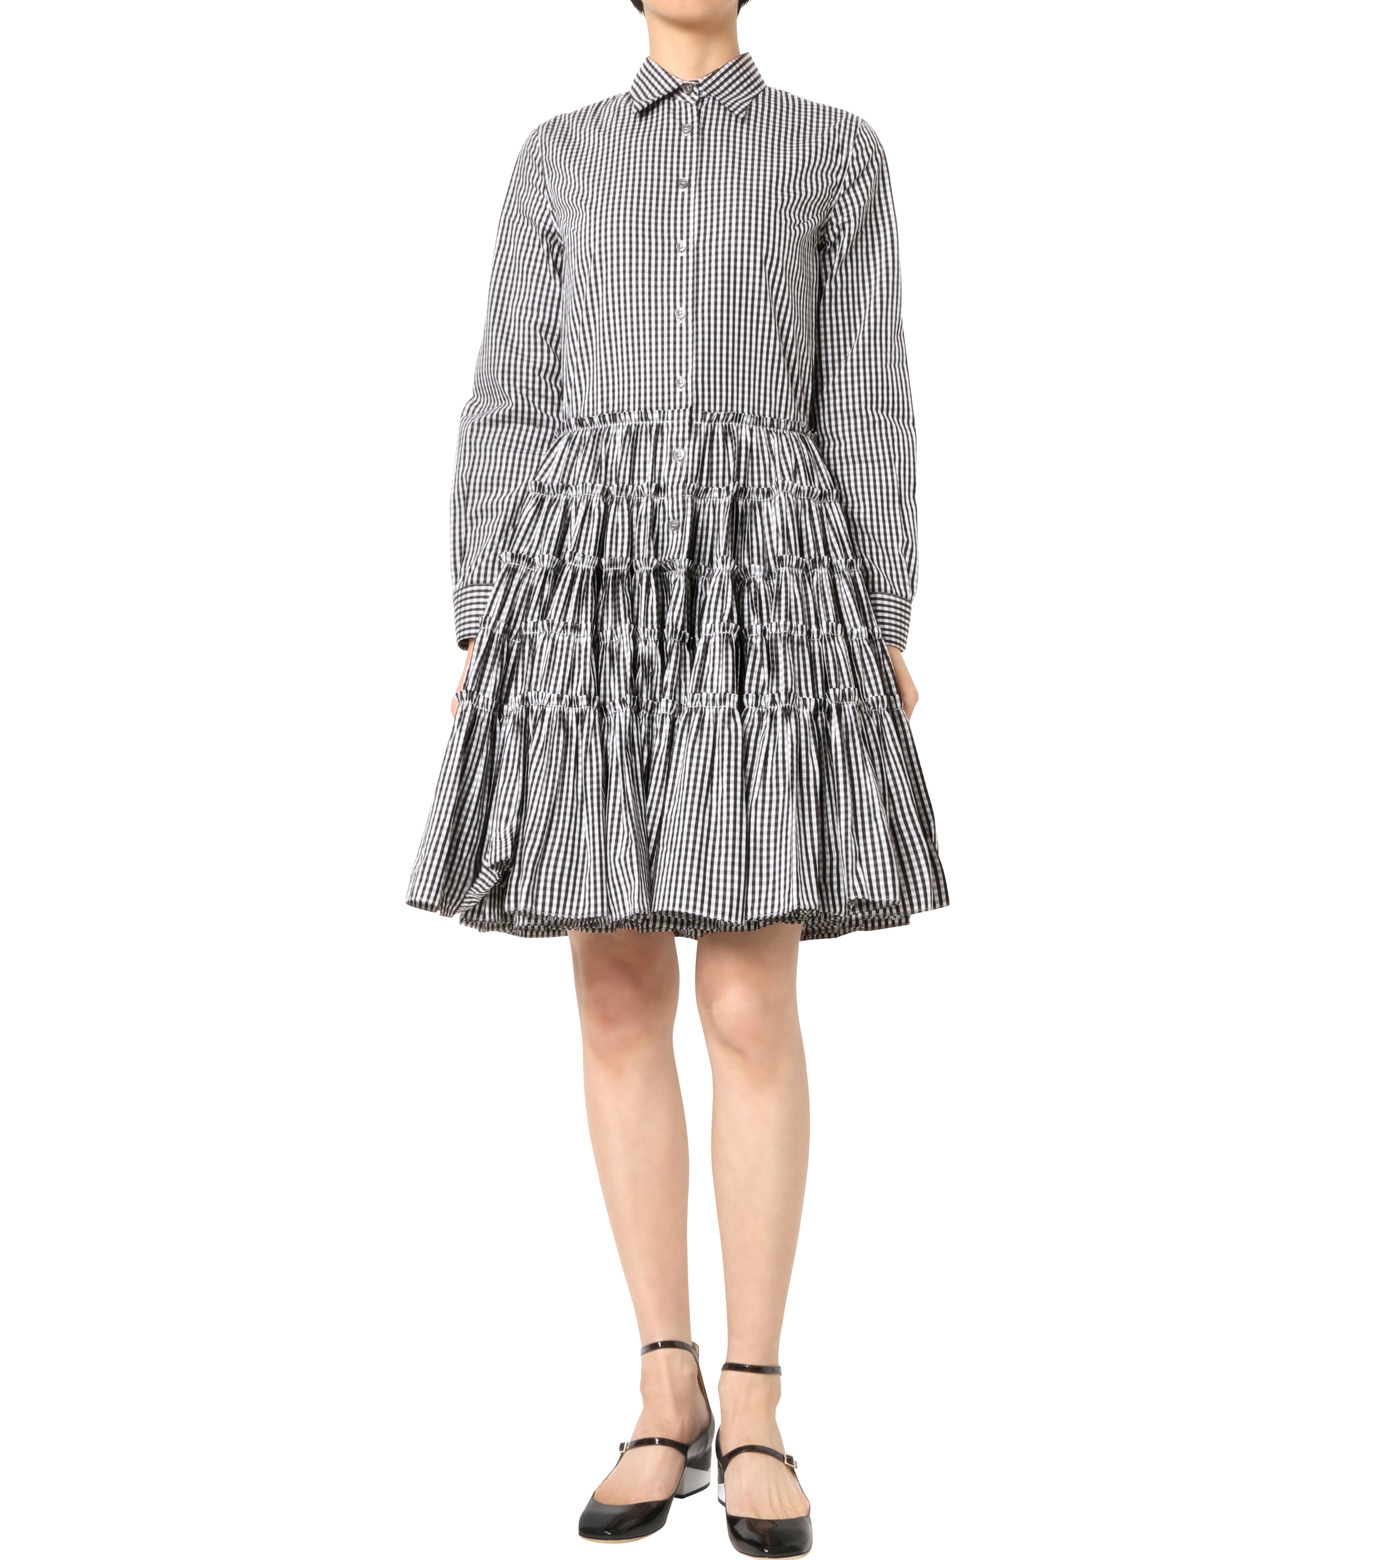 Jourden(ジョーダン)のBlack&White Gingham Shirt Dress-BLACK(ワンピース/one piece)-1603WR2TH03-13 拡大詳細画像1